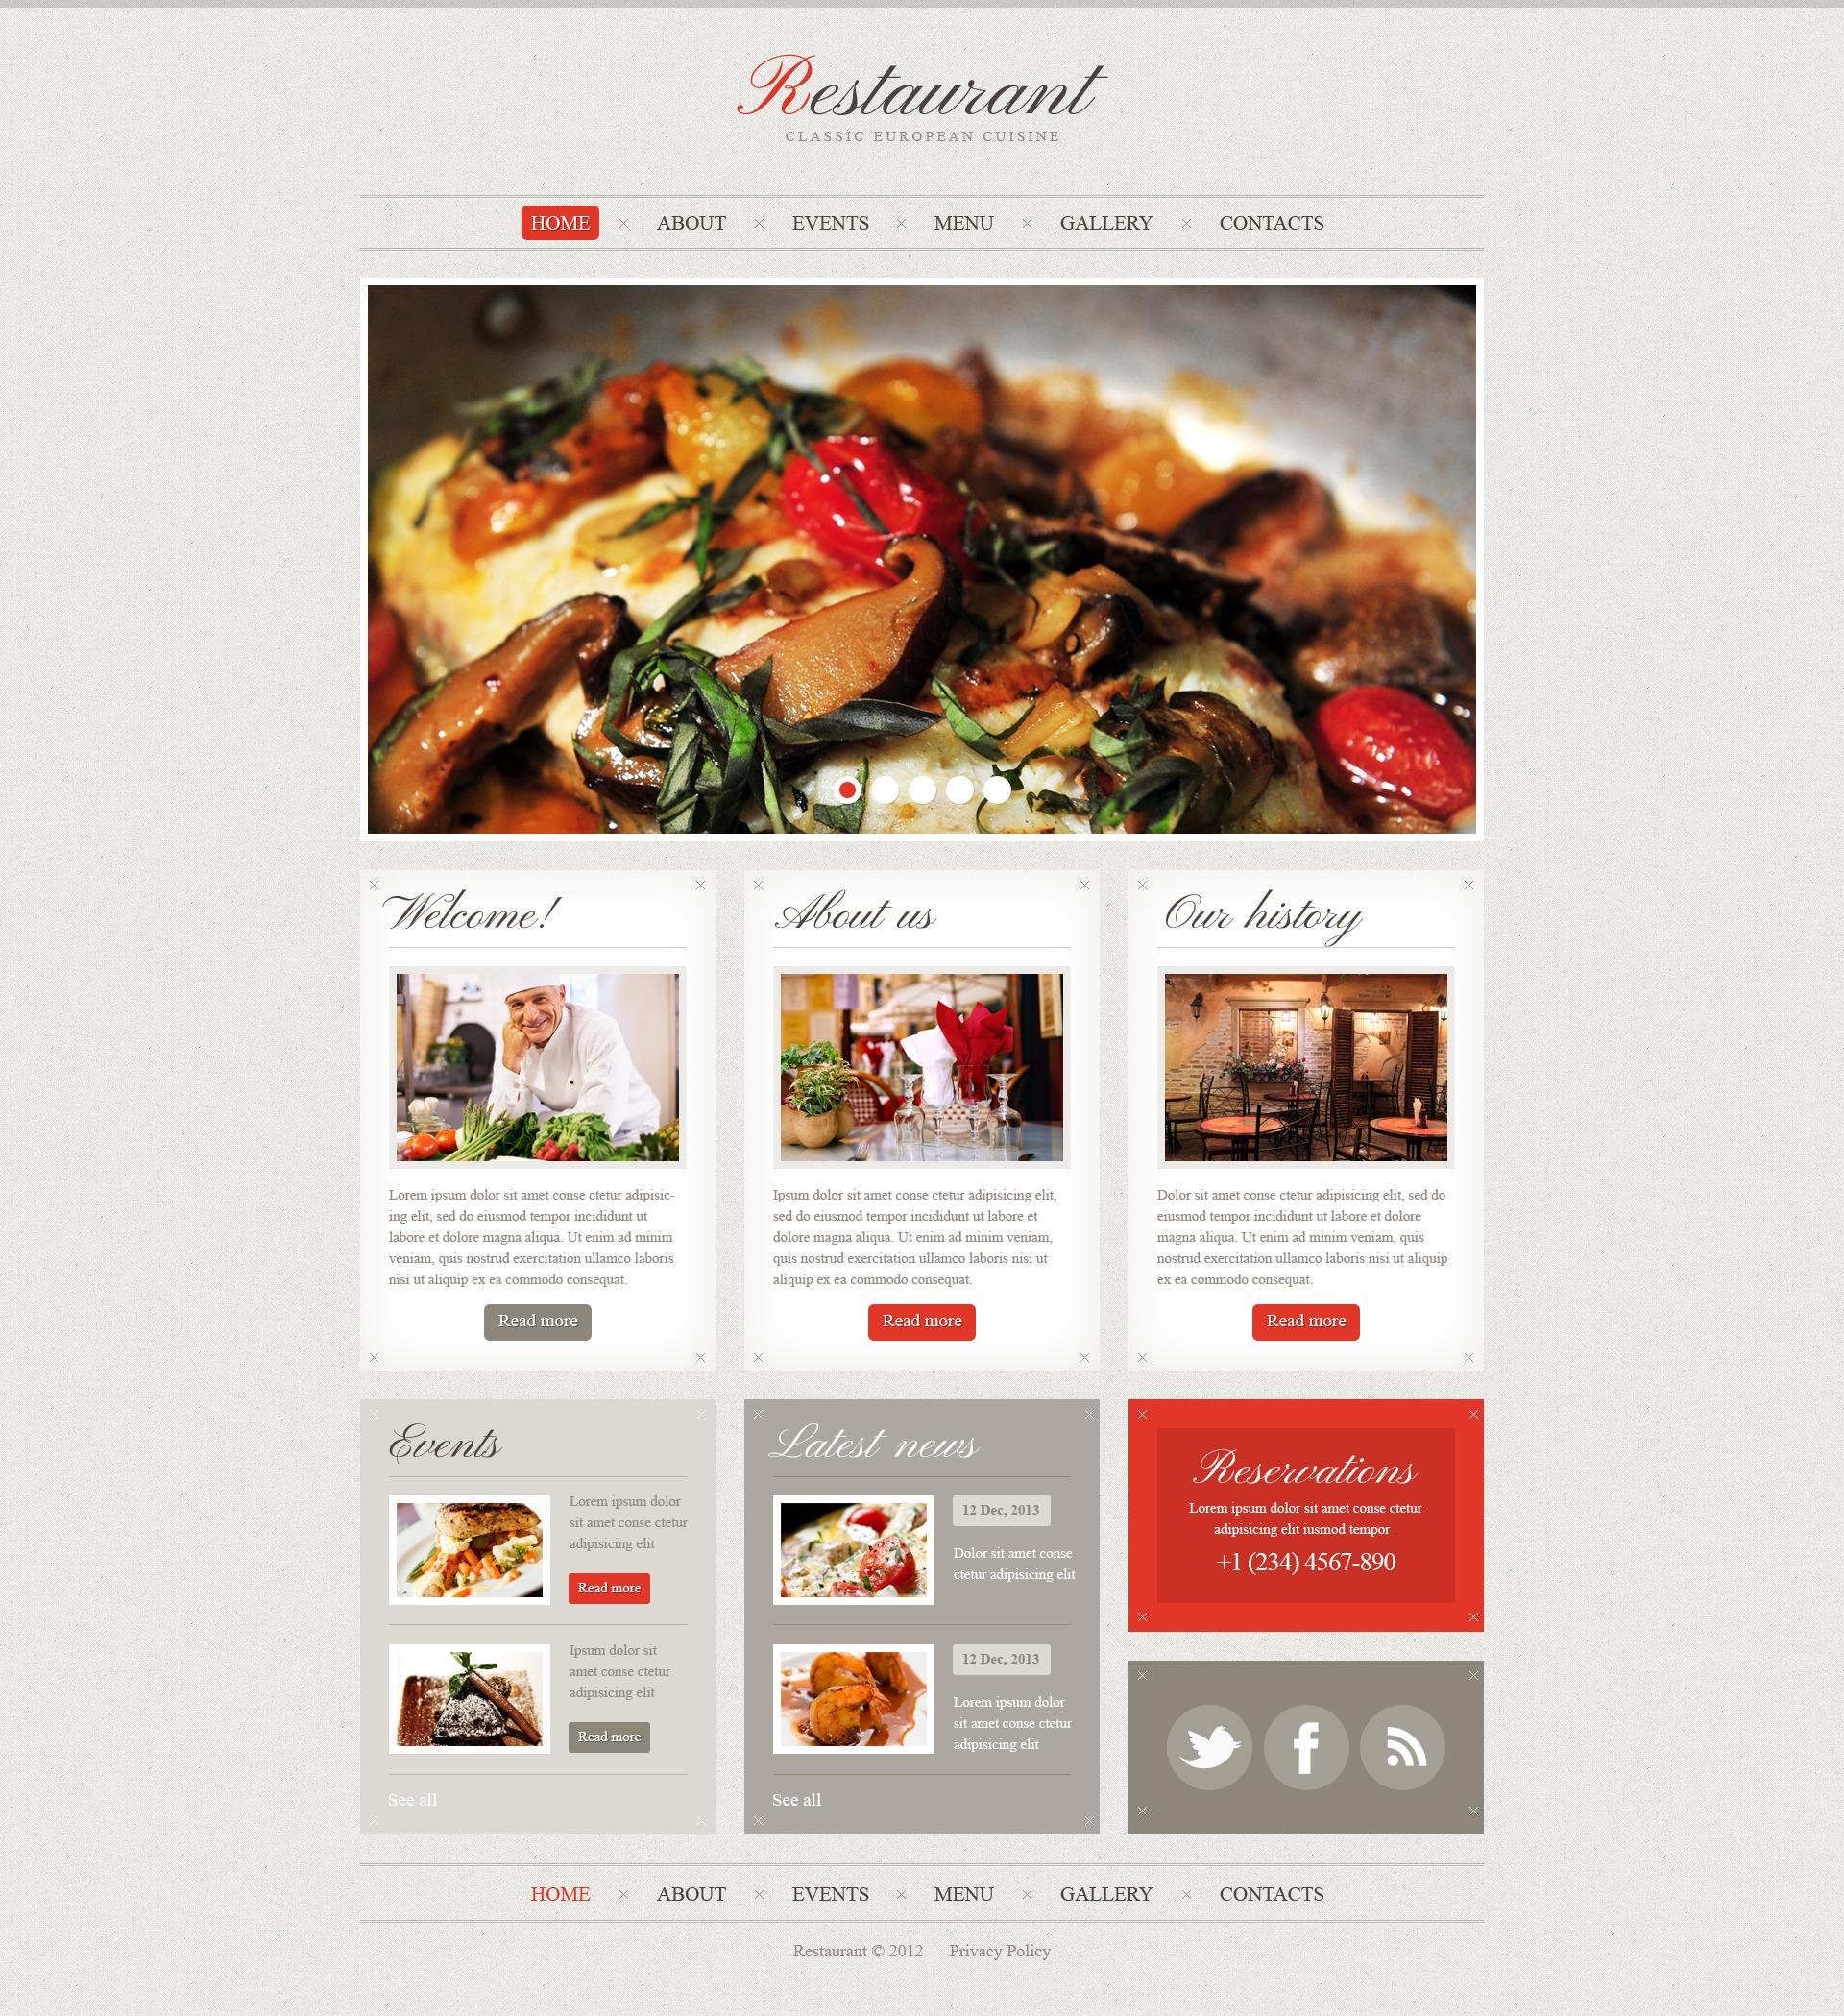 Großartig Restaurant Flyer Vorlage Galerie - Entry Level Resume ...